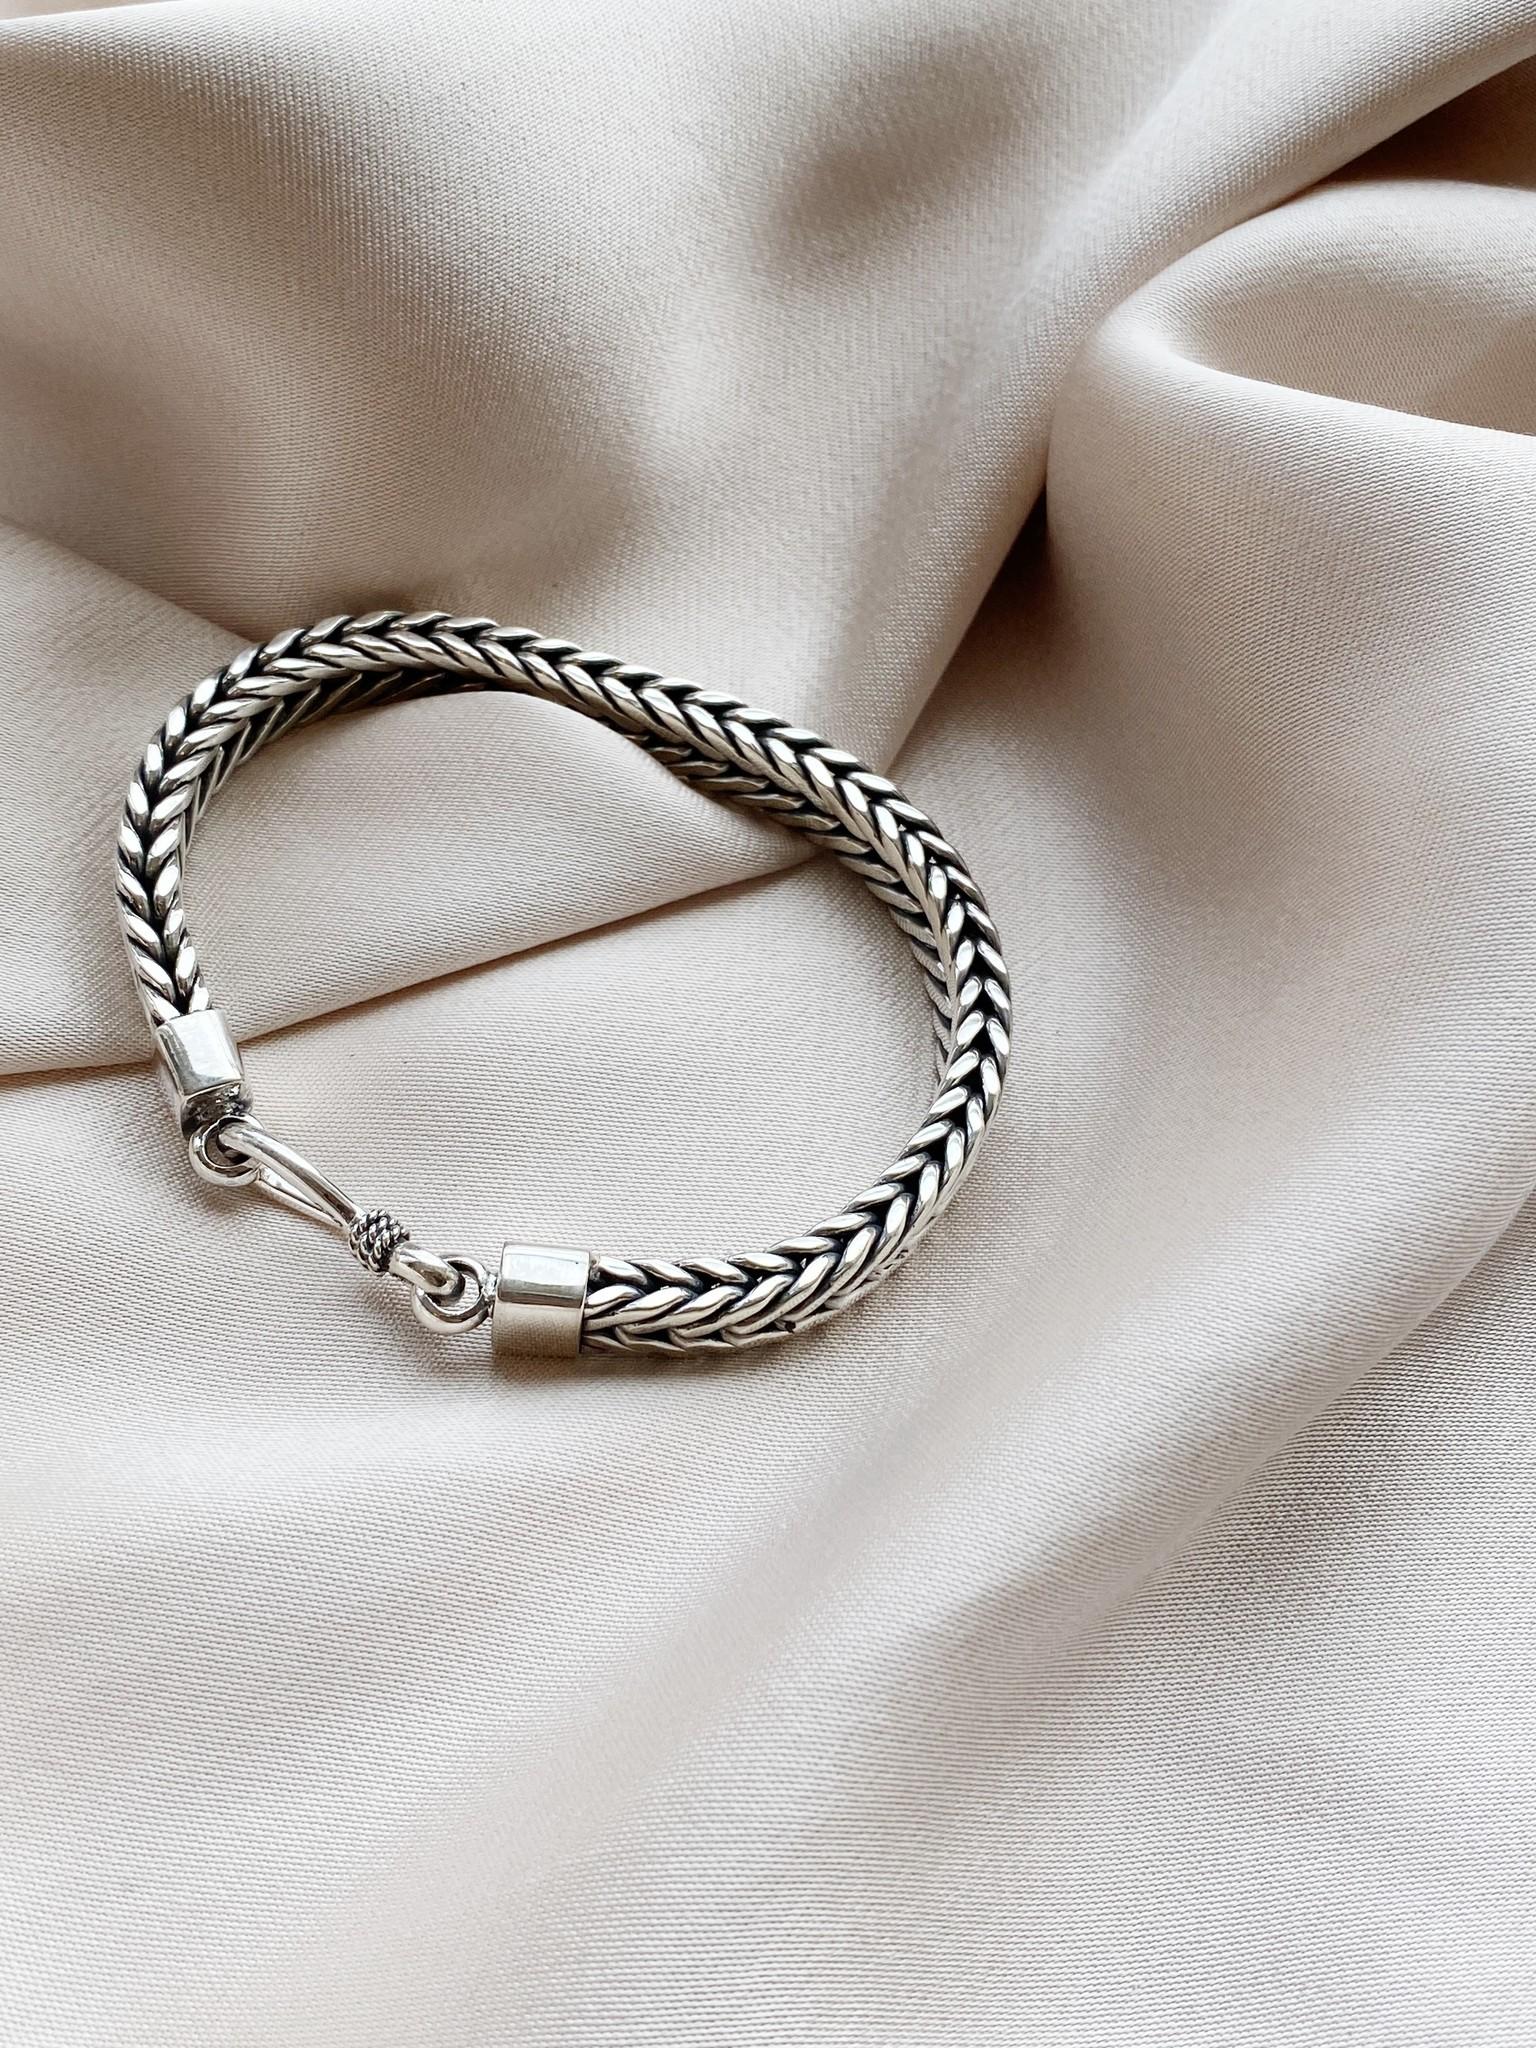 Bracelet 7-1